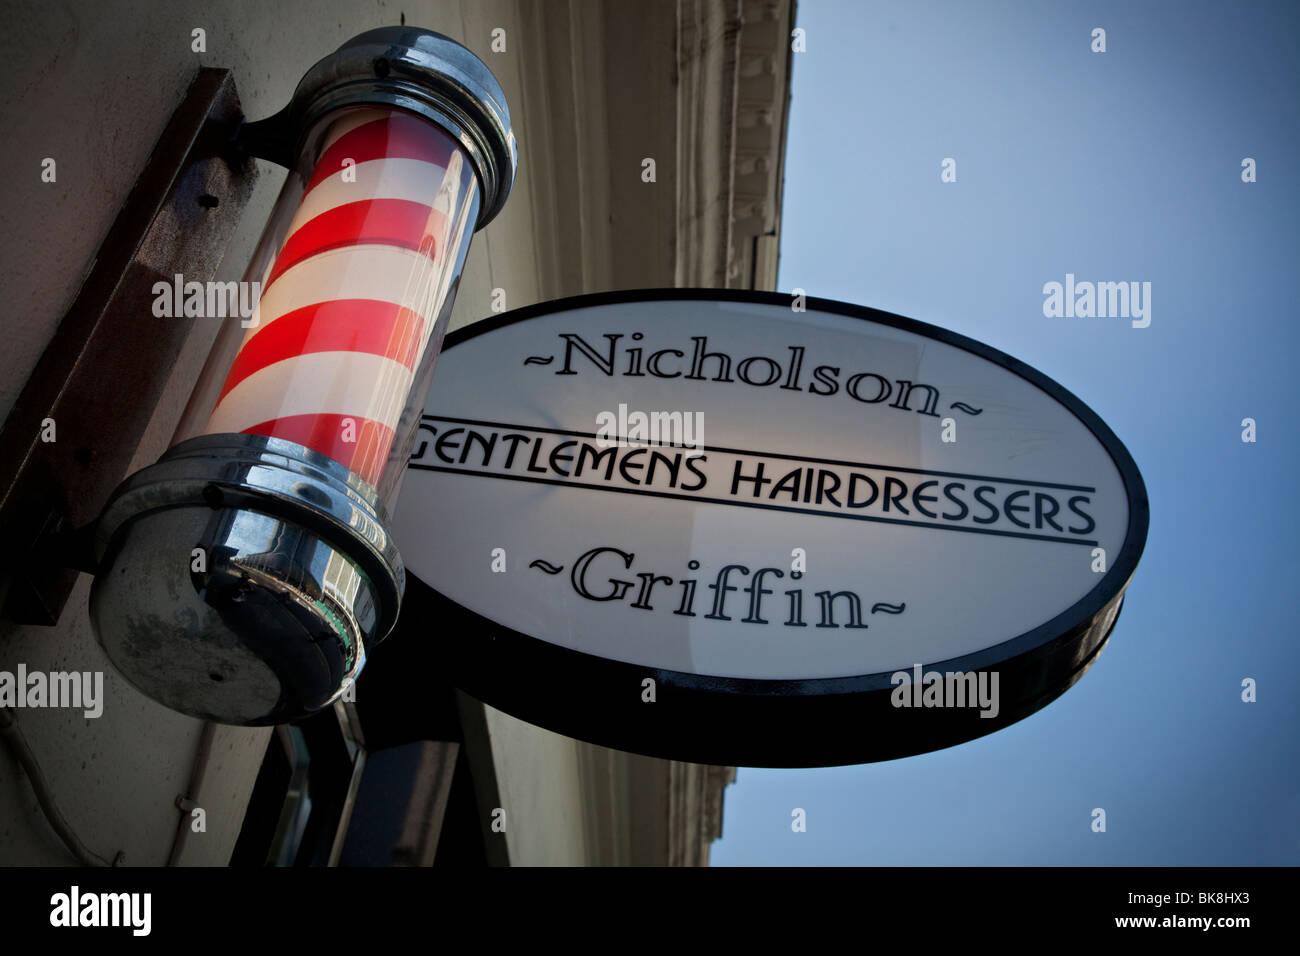 Barber's pole outside gentleman's hairdresser in London, UK - Stock Image